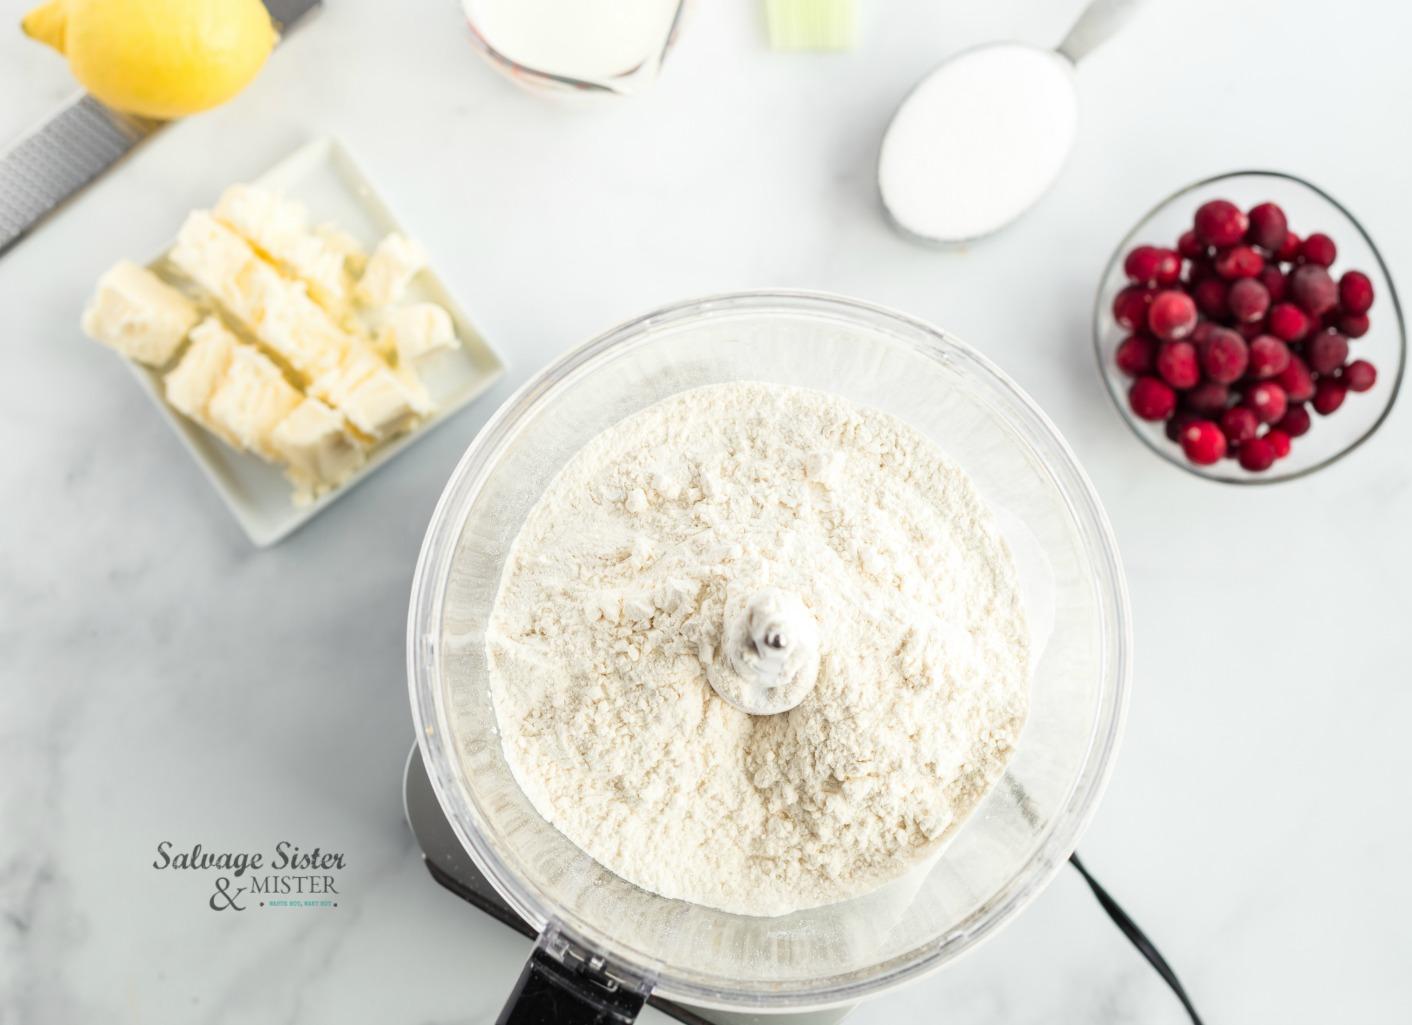 recipe on salvagesisterandmister.com